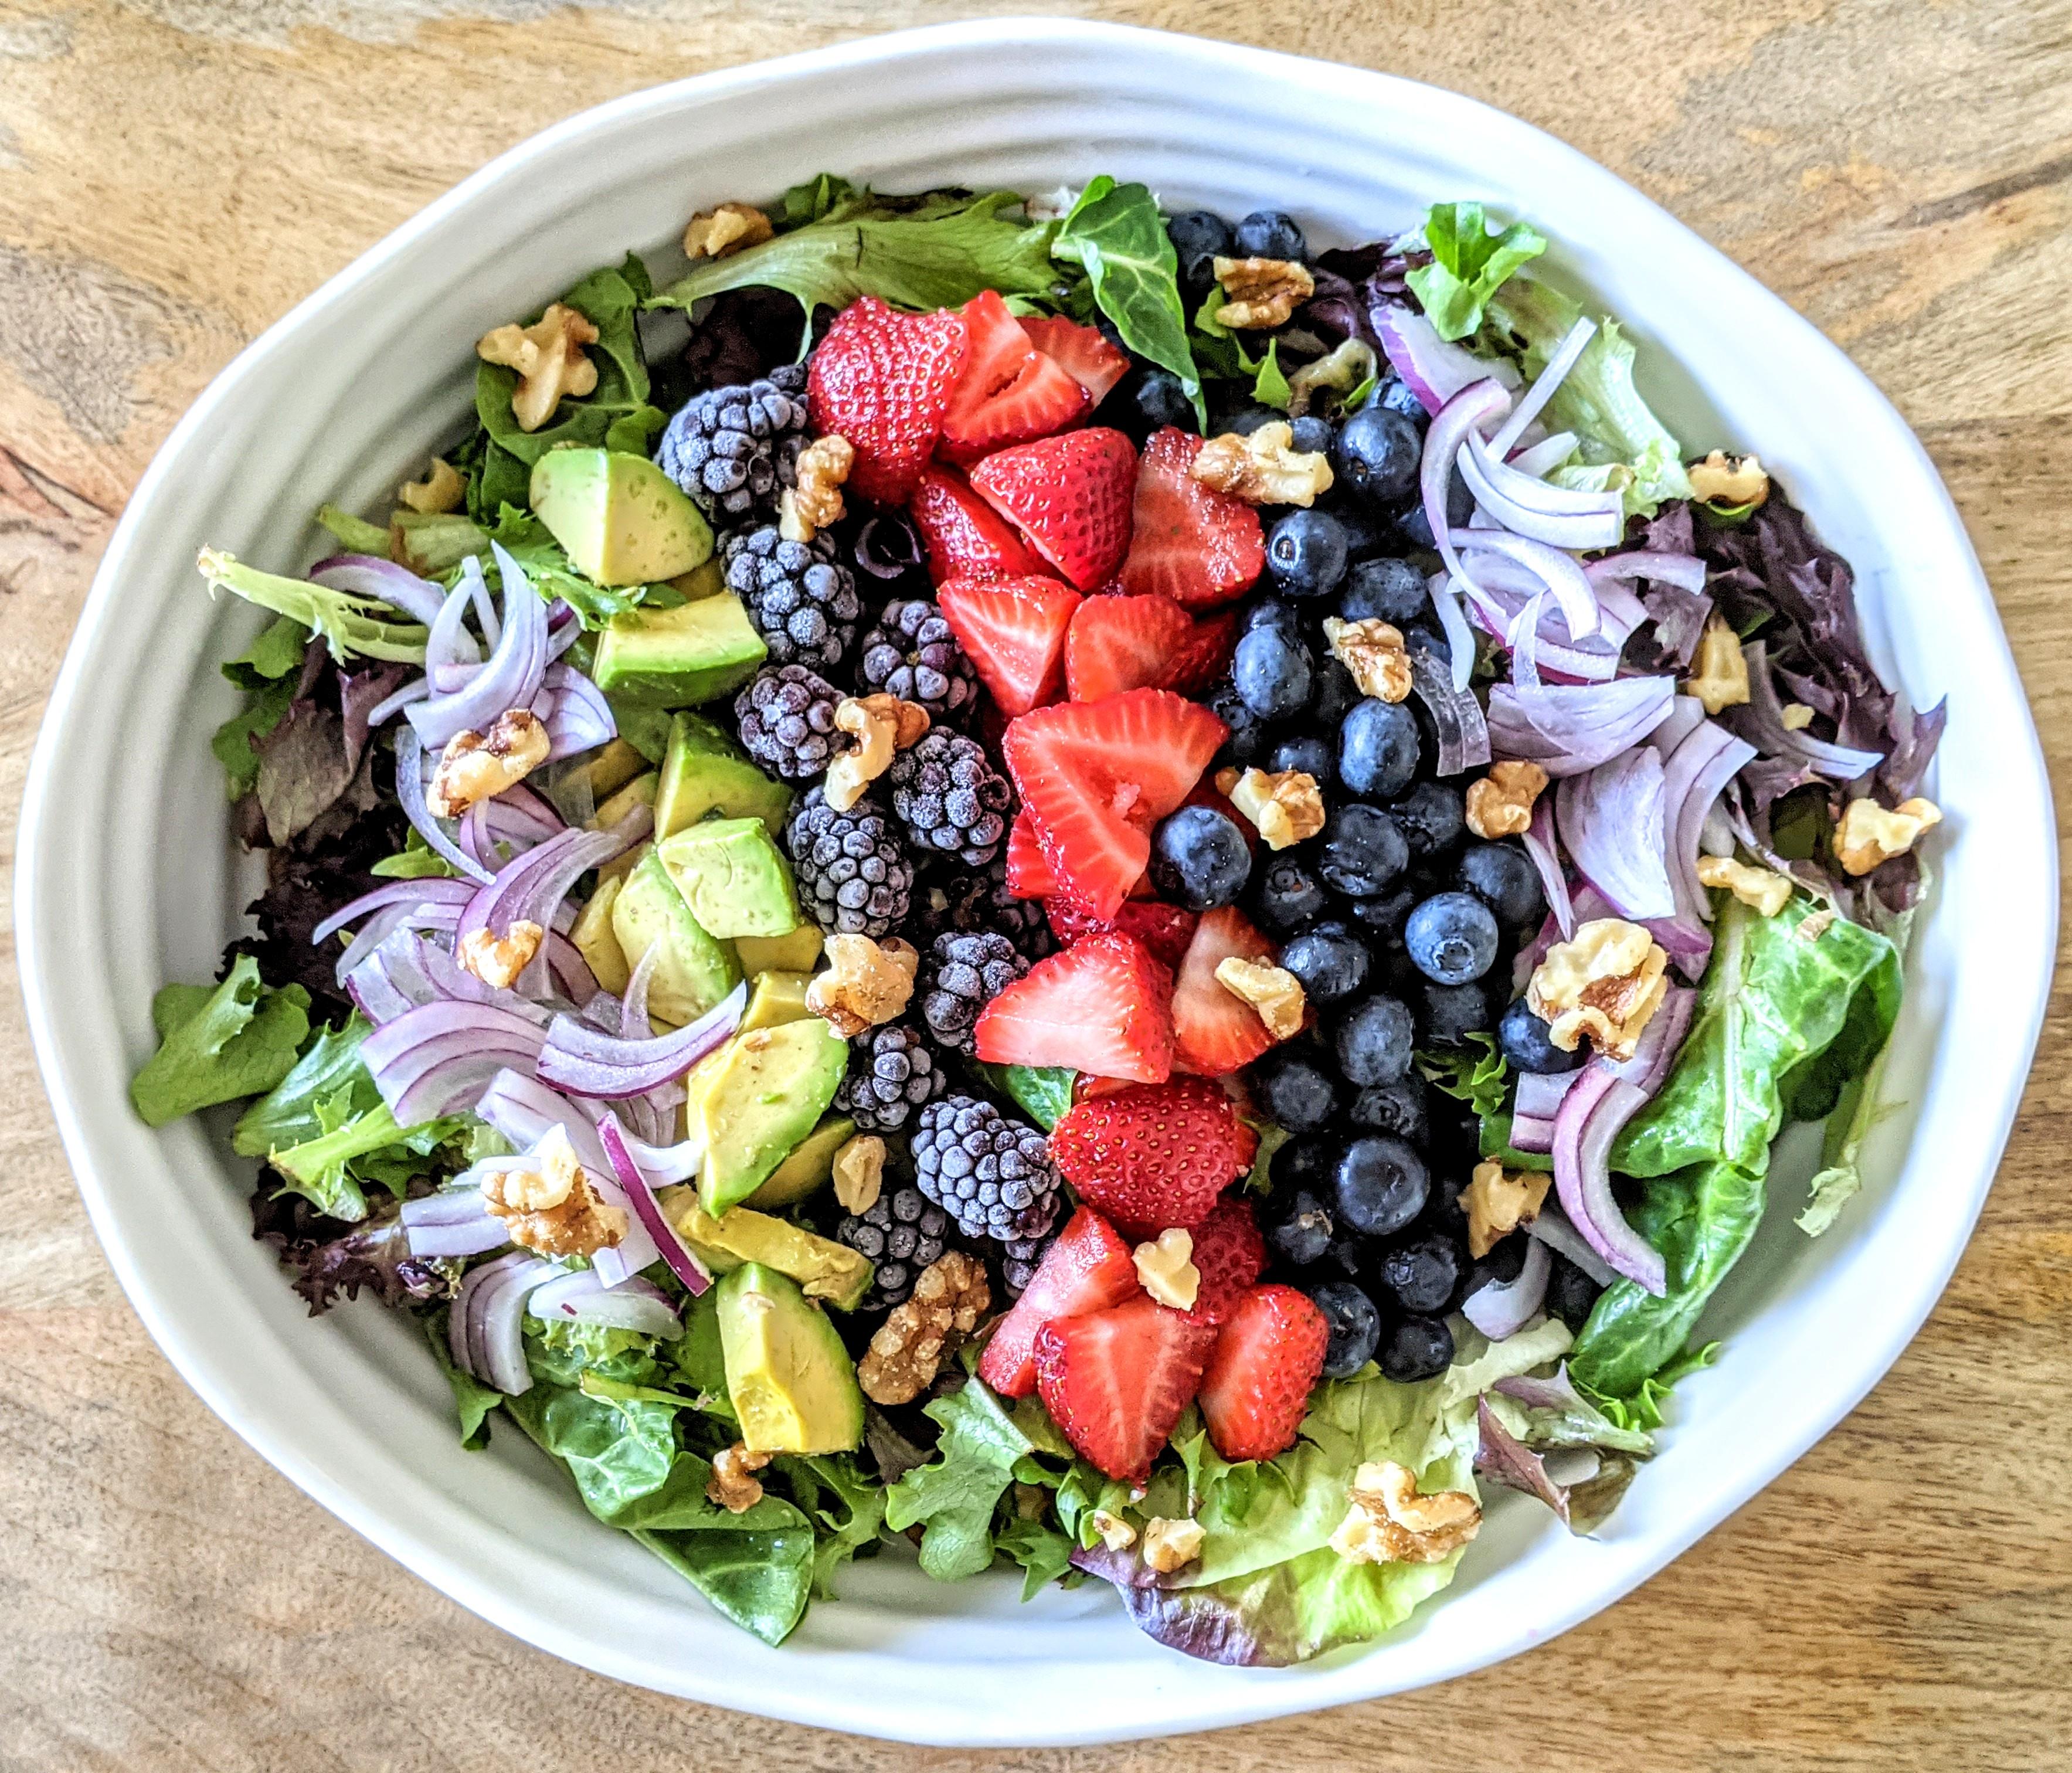 Triple Berry Summer Salad (AIP, Plant-Based, Paleo)